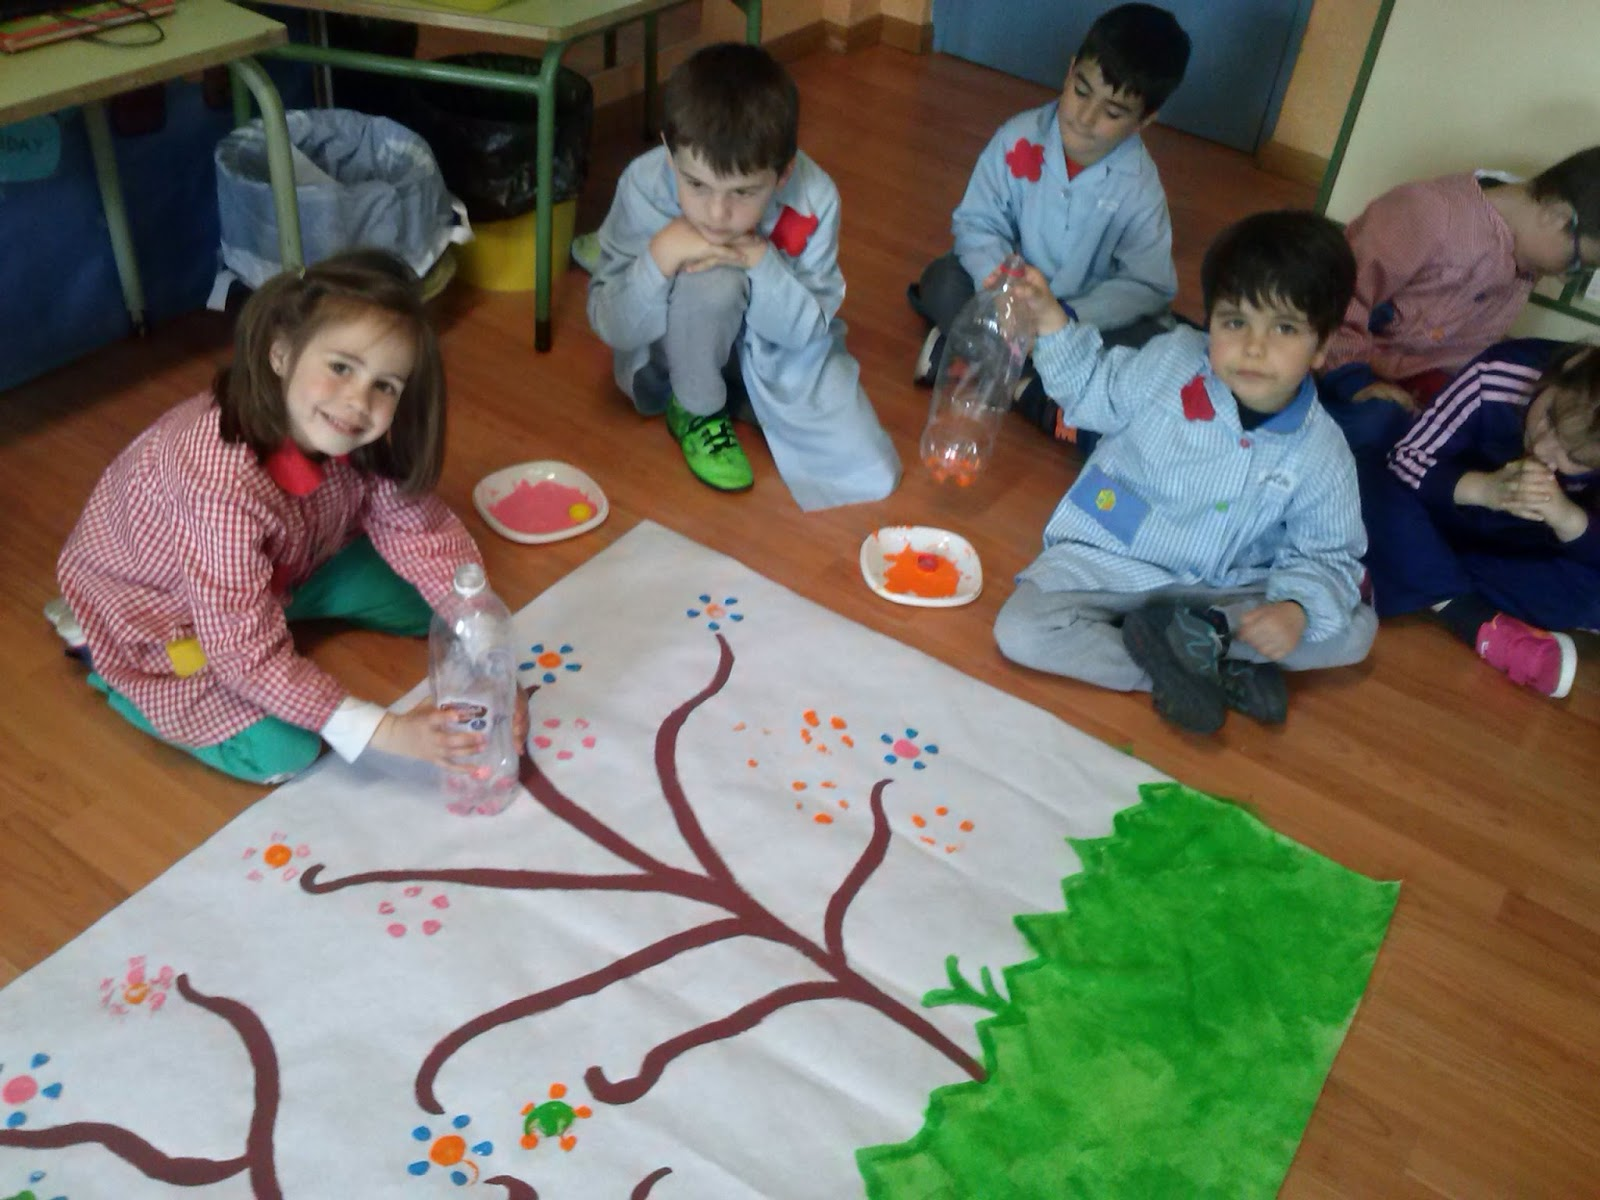 Raquel infantil decoraci n de primavera for Decoracion primavera infantil